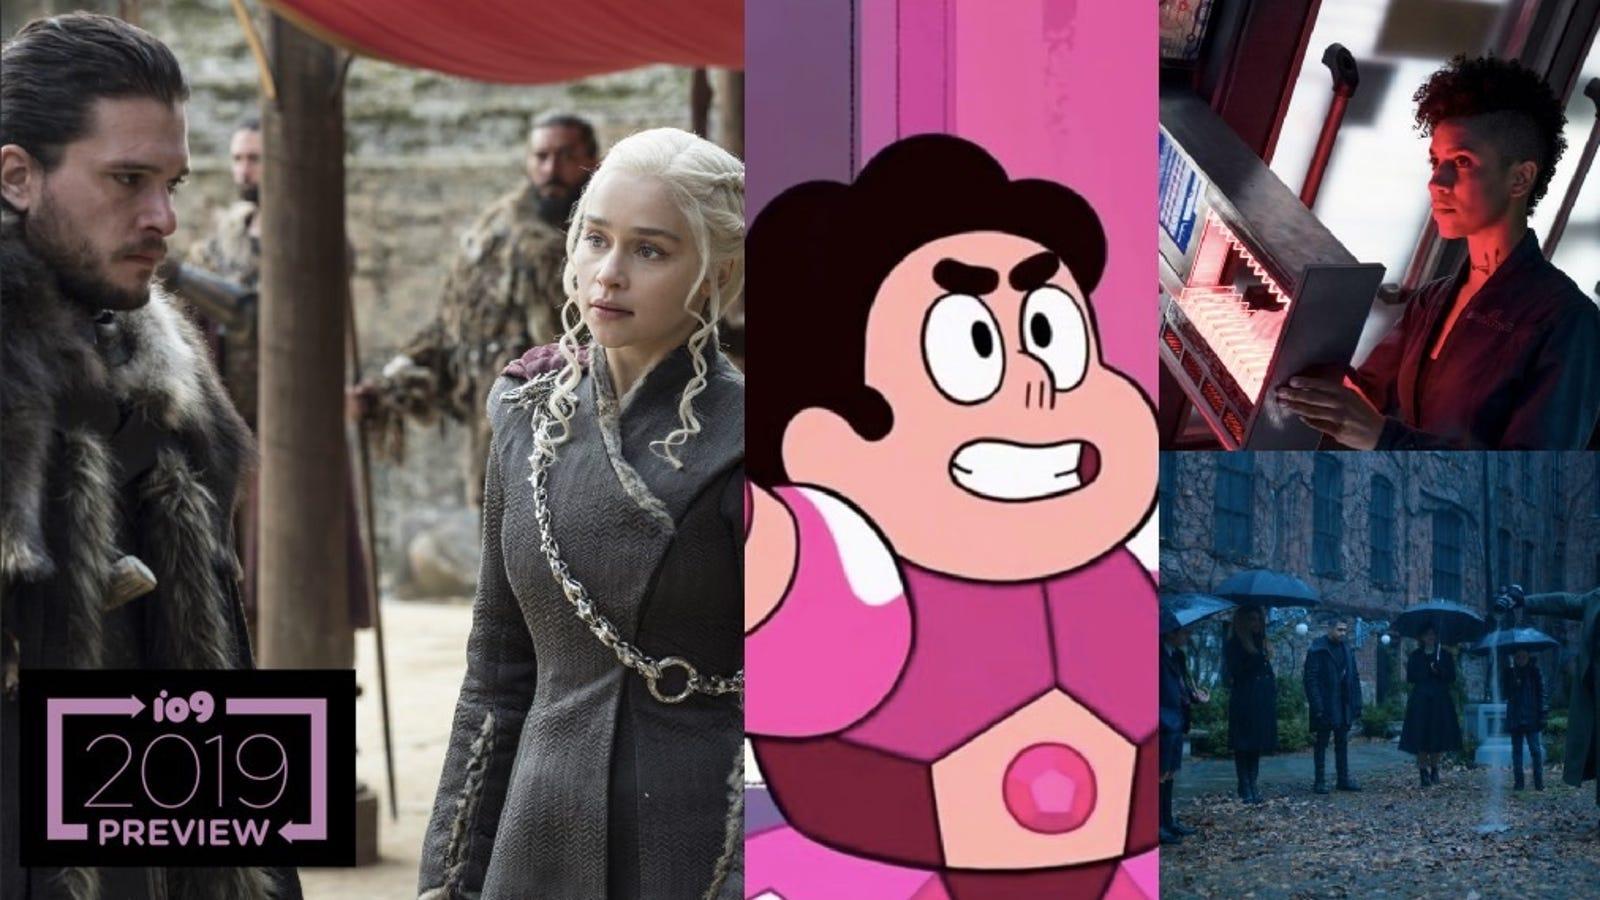 io9's Ultimate Guide to 2019's Sci-Fi, Fantasy, and Superhero TV